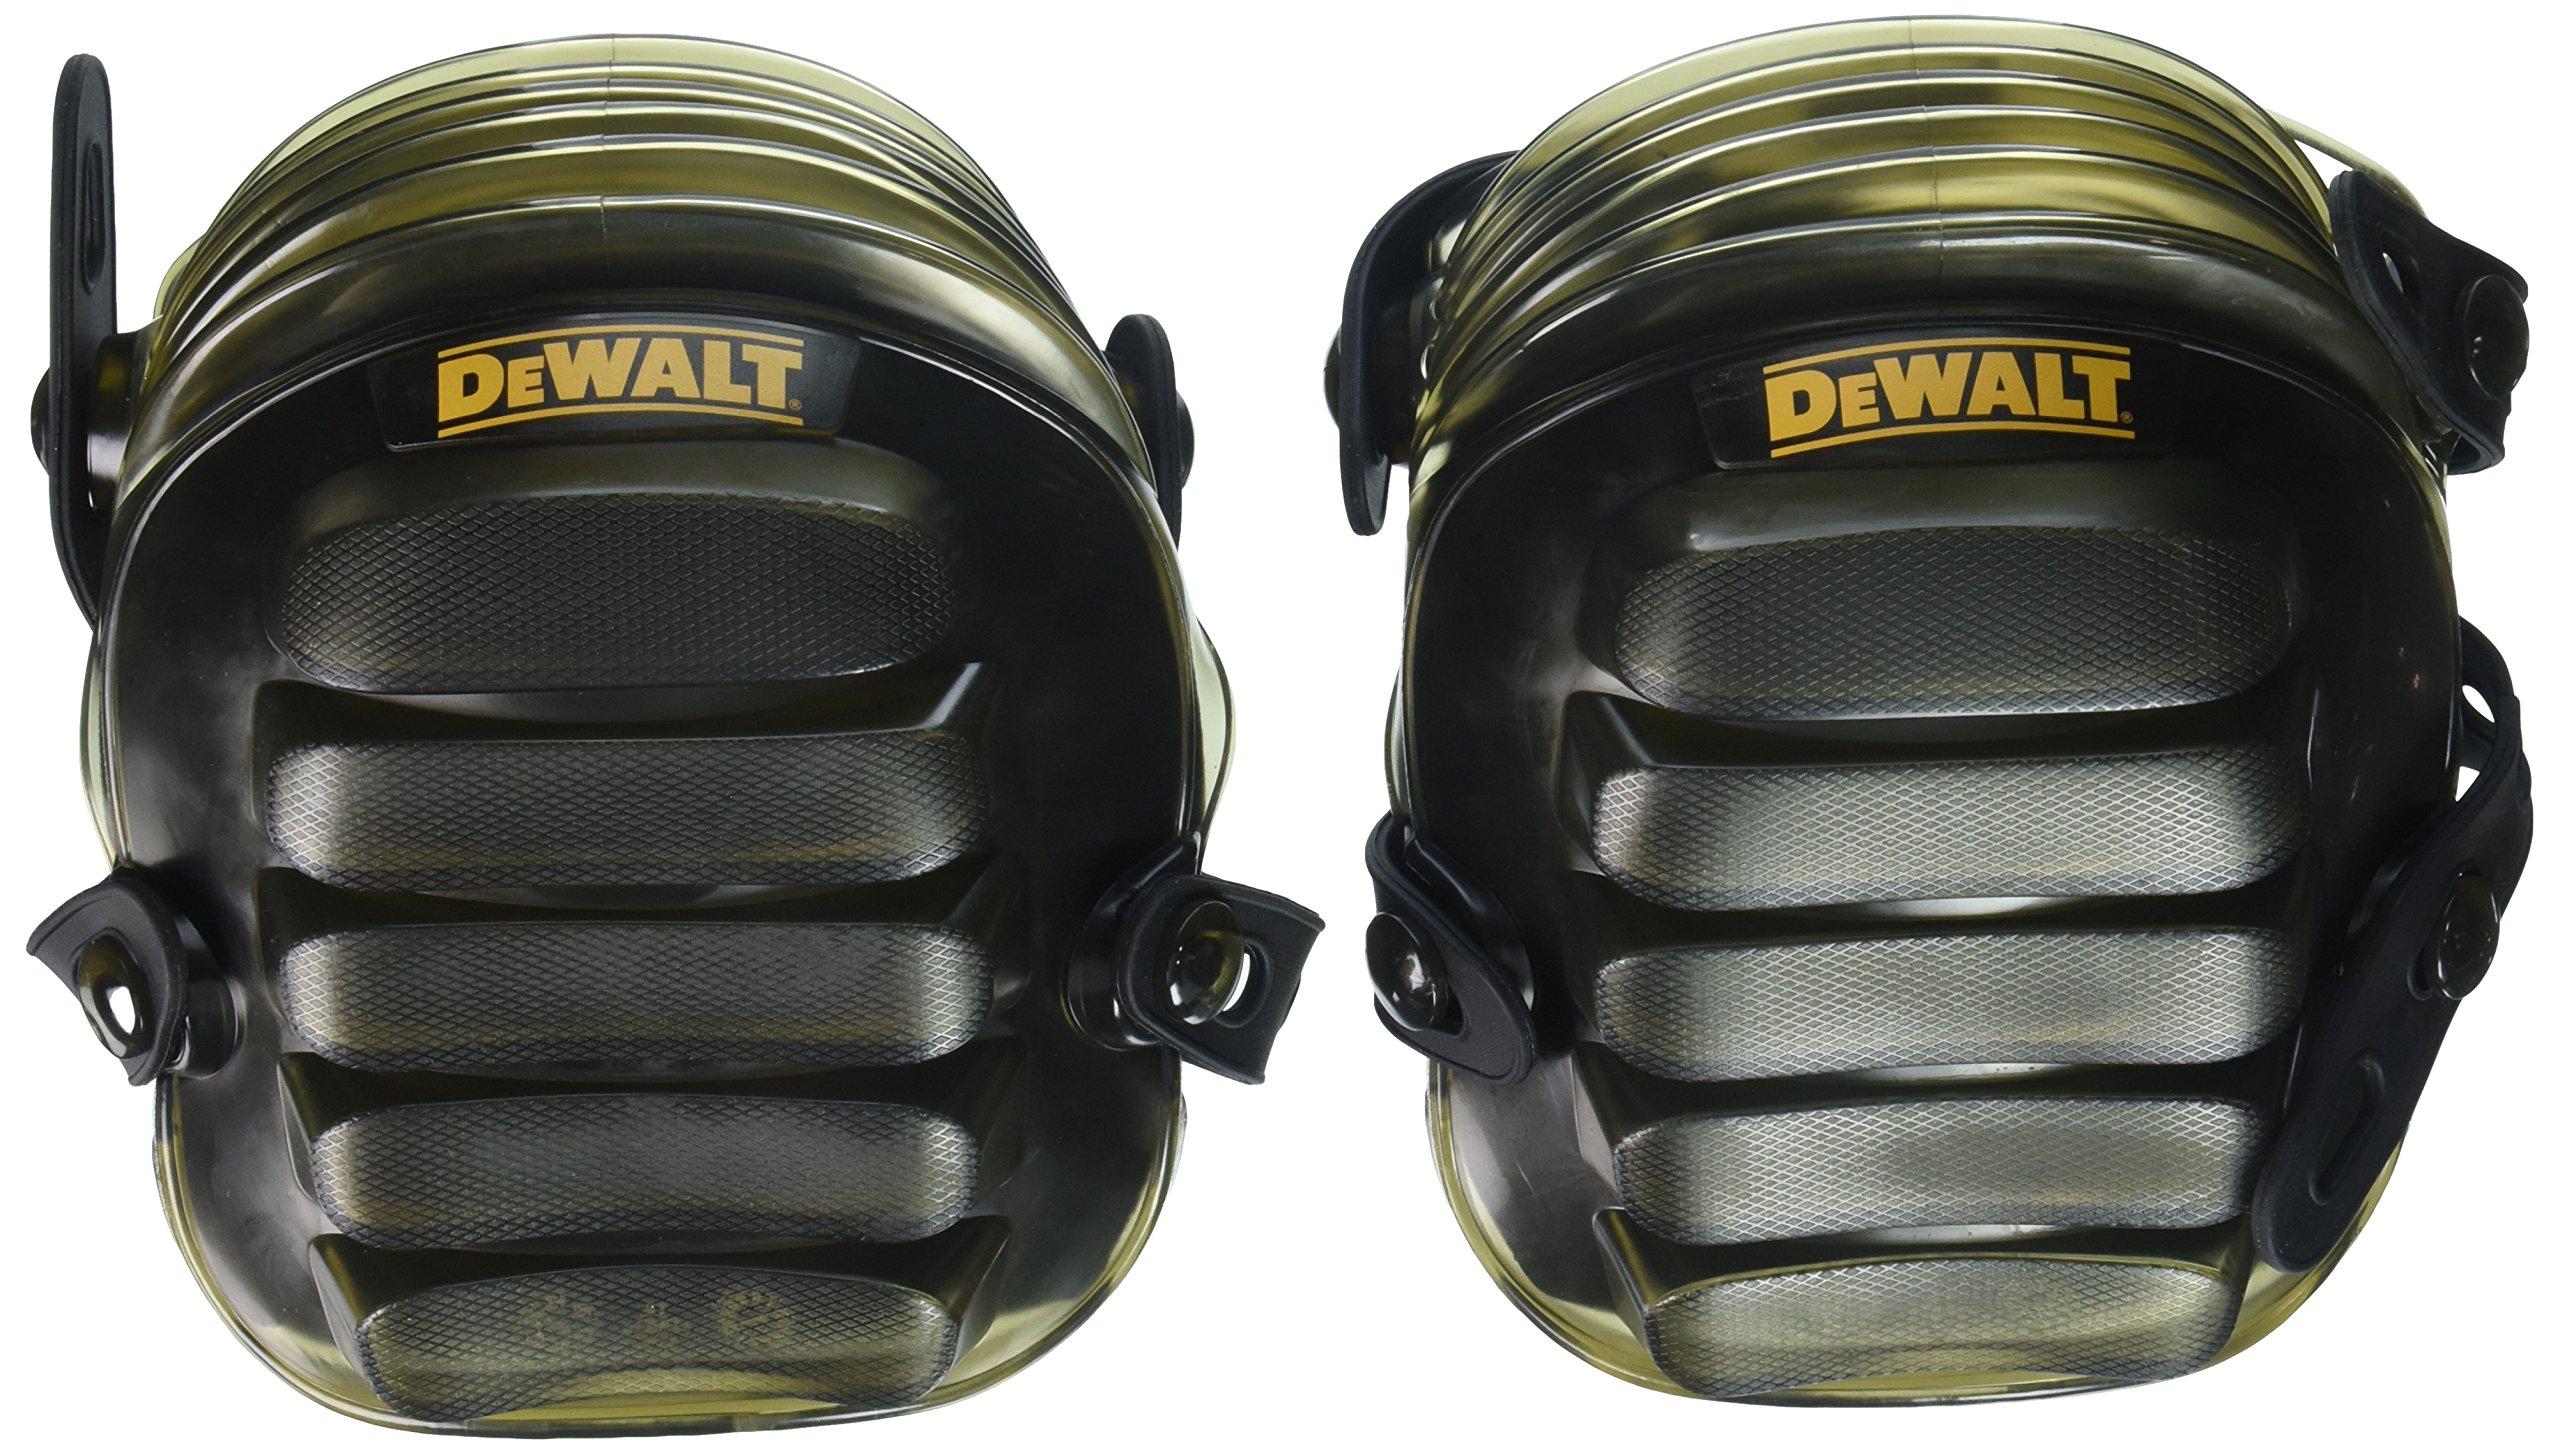 DEWALT DG5217 All-Terrain Kneepads with Layered Gel Padding with Full Size, All Terrain Cap by DEWALT